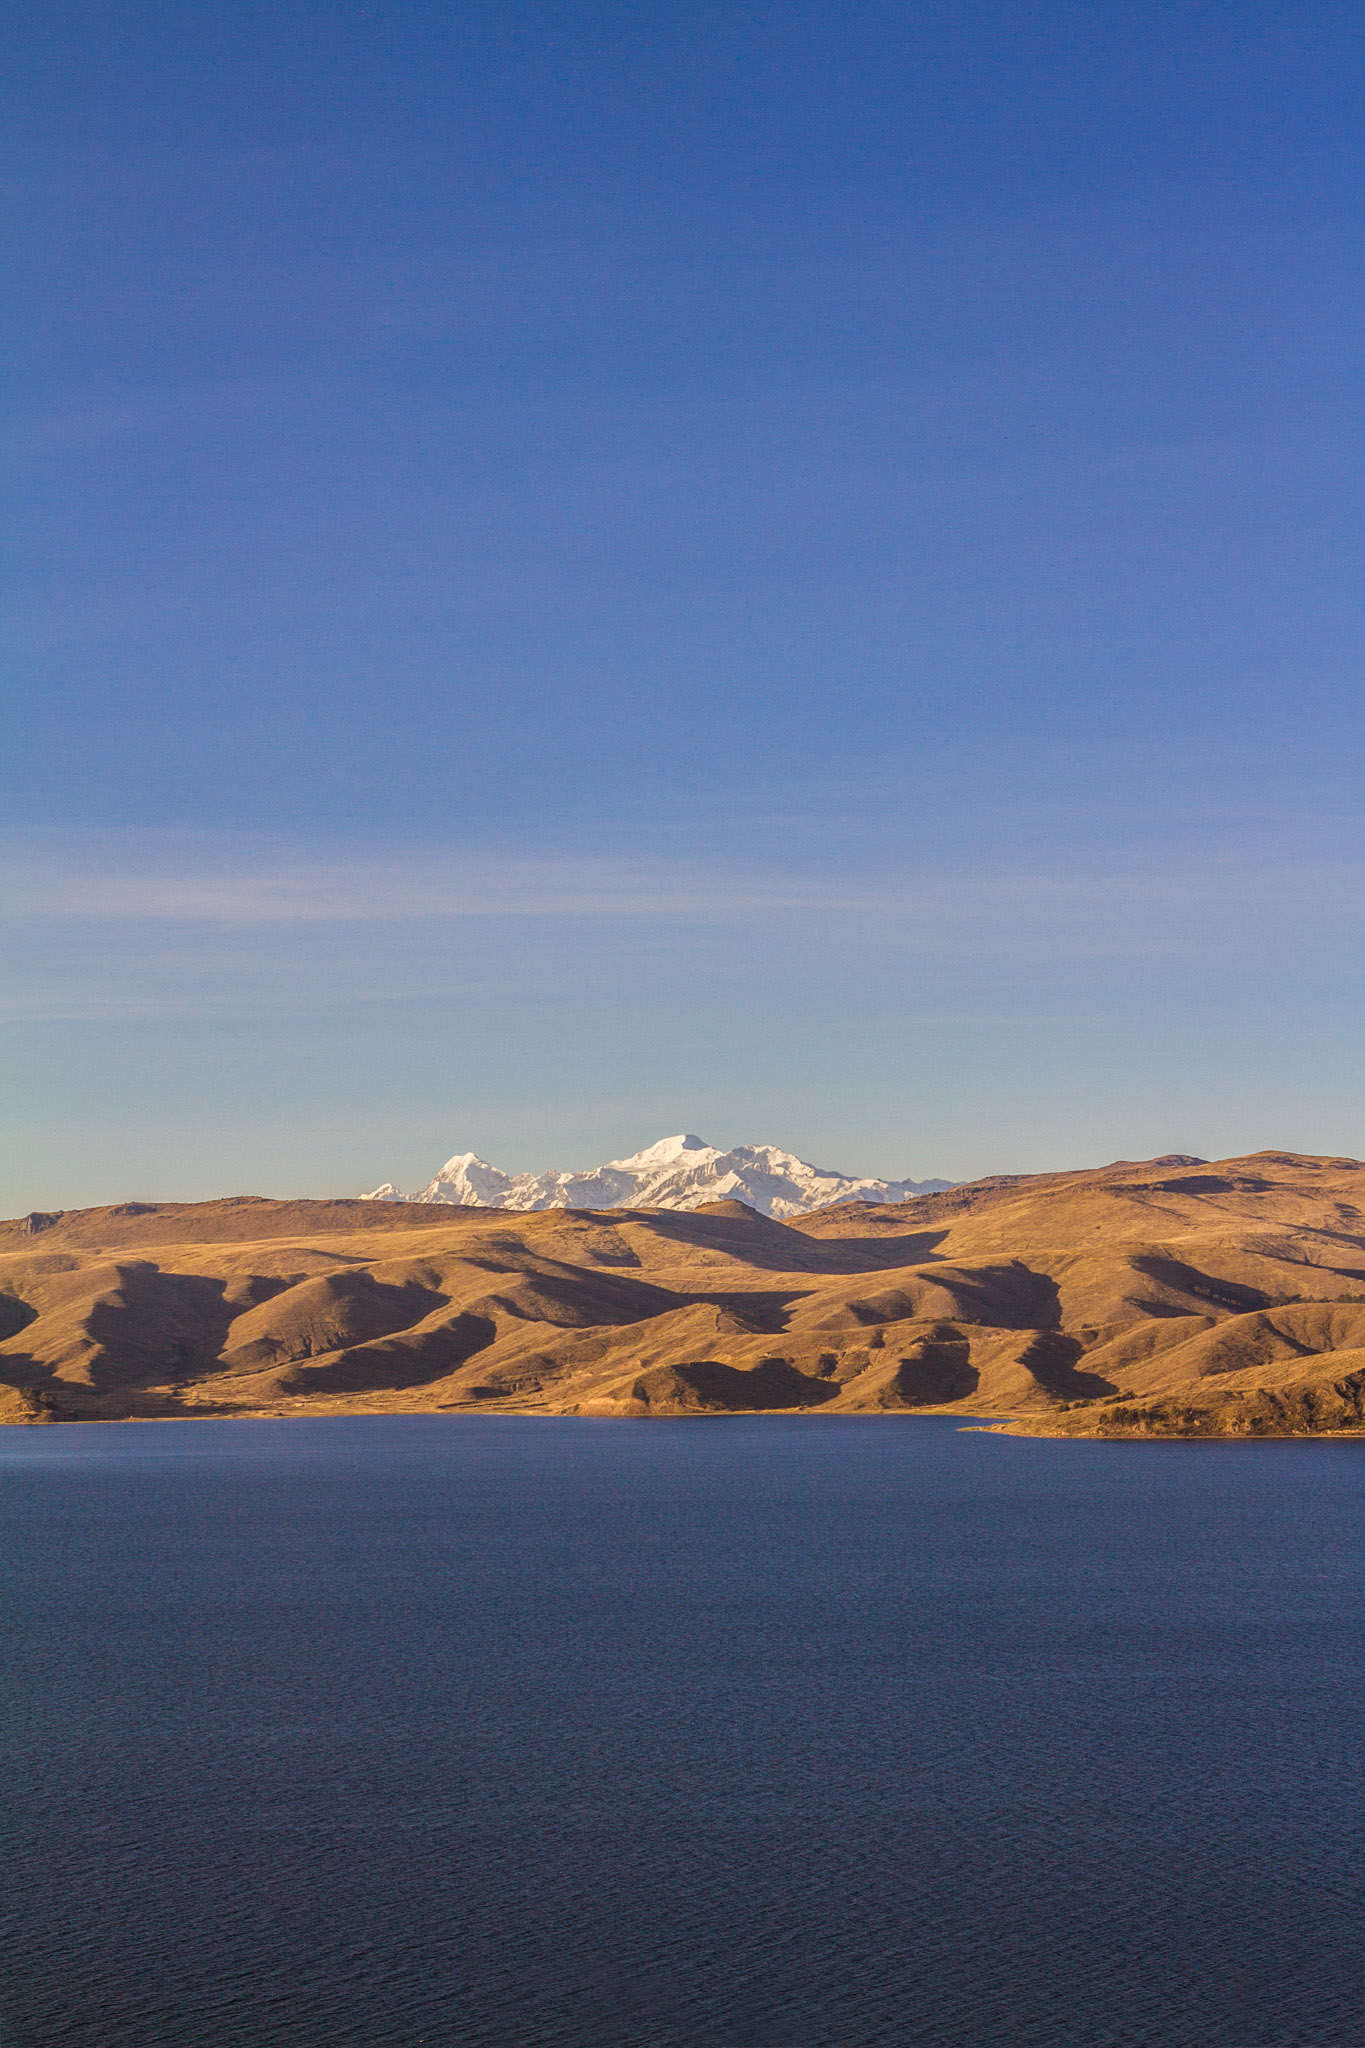 Ali-Barqawi-Studios-Explore-Series-Travel-Adventure-Documentary-C4CGAZA-Bolivia-Lake-Titicaca-2015-094.jpg